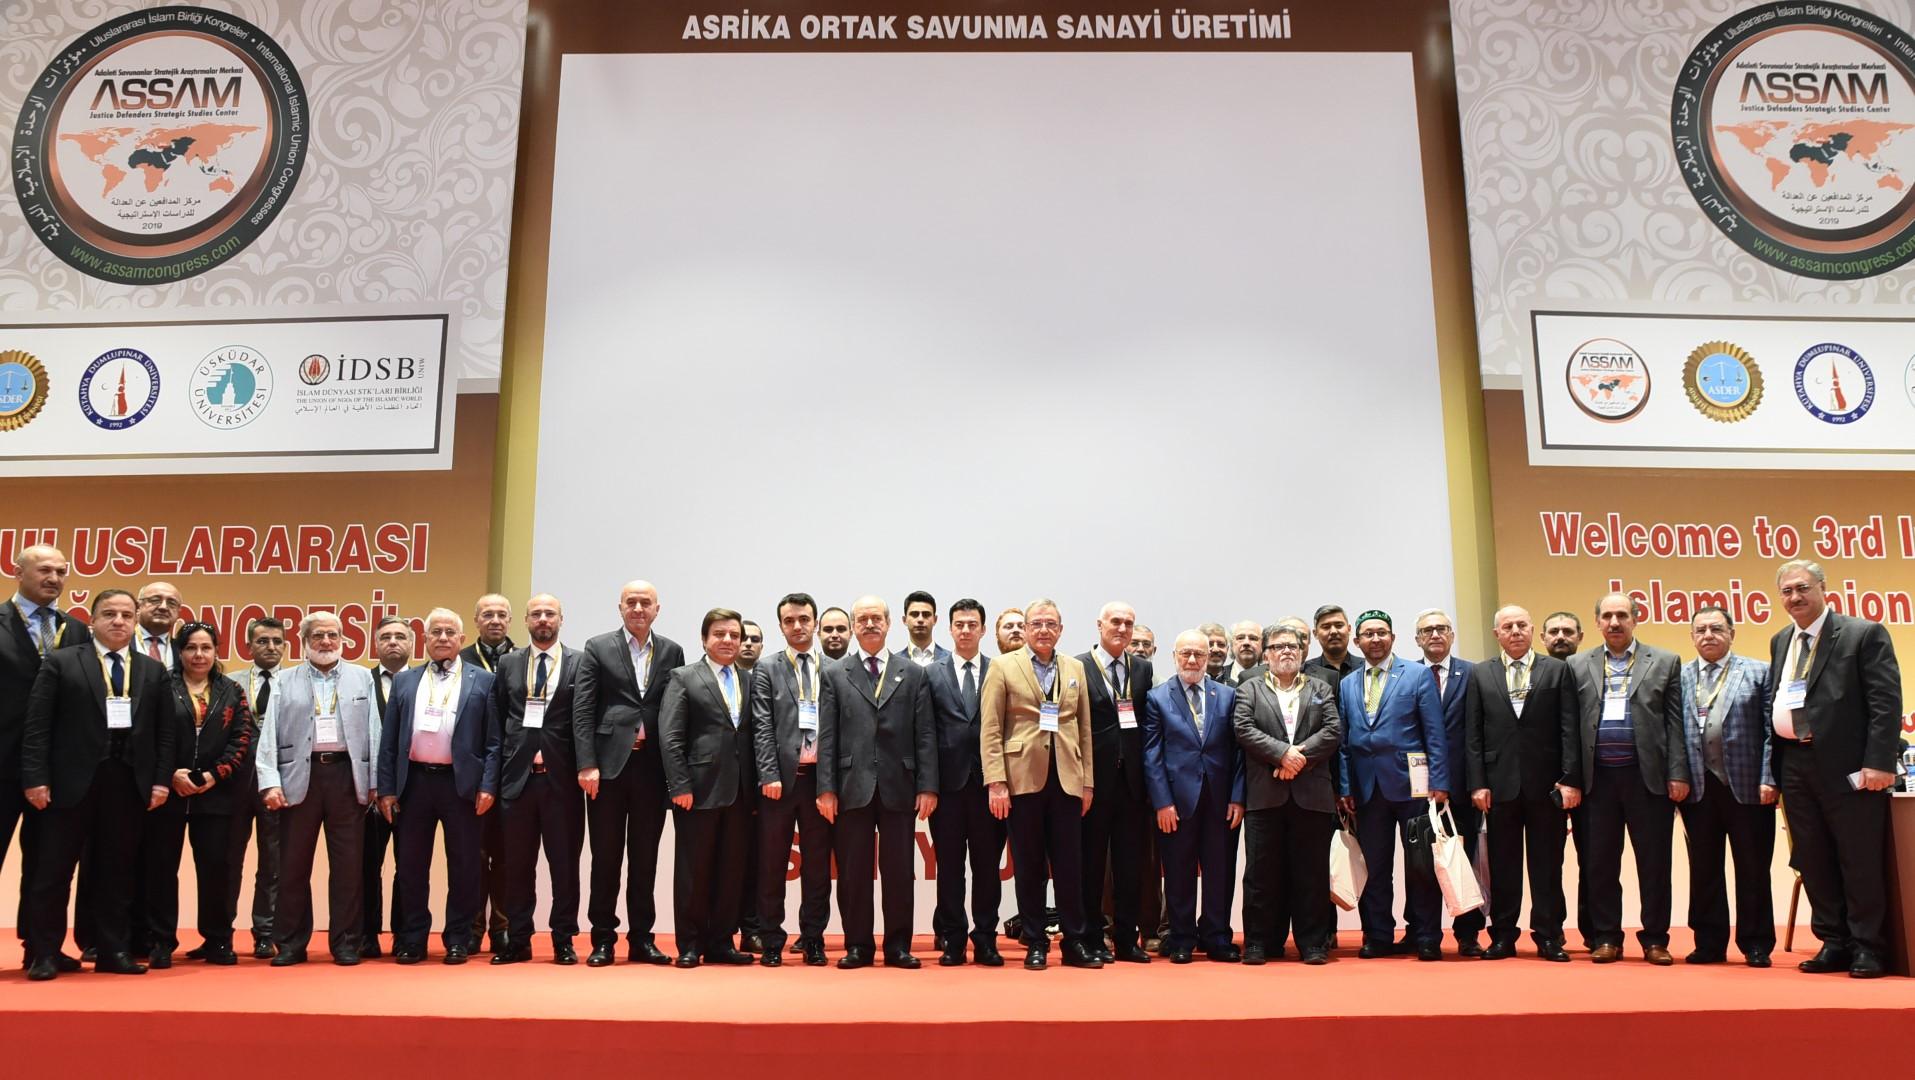 ASSAM and Islamic Union Congresses